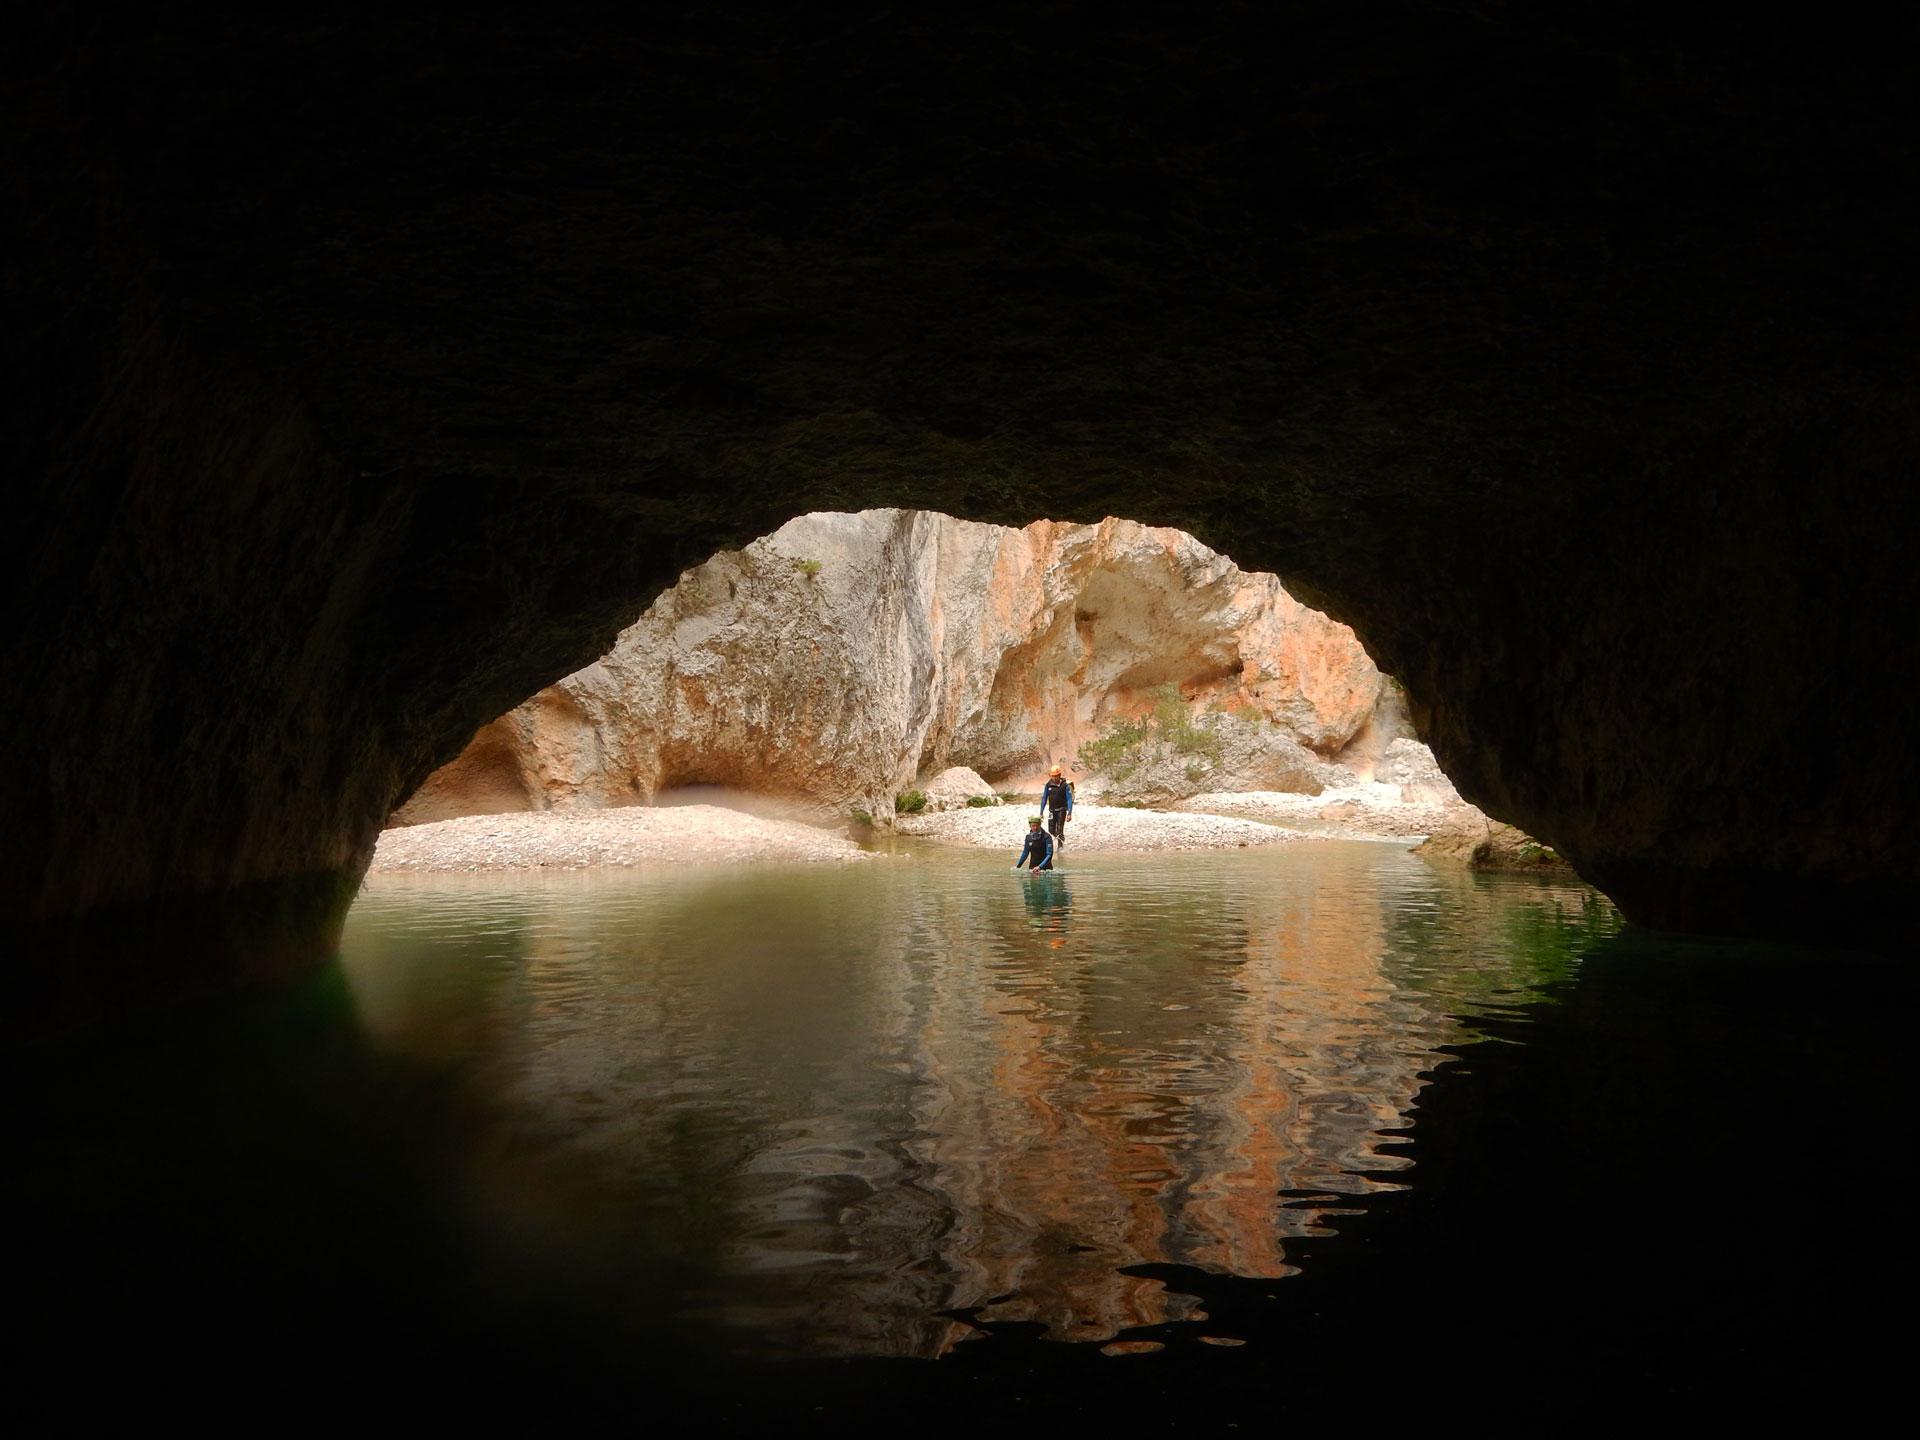 Canyoning en Ariège, séjour au canyon de la Sierra en Espagne - Vertikarst